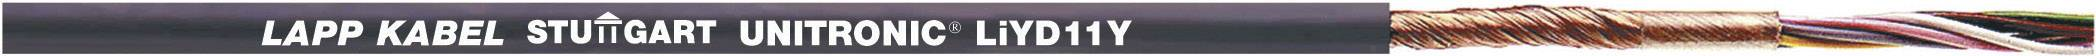 Datový kabel UNITRONIC LIYD11Y 4x0,14